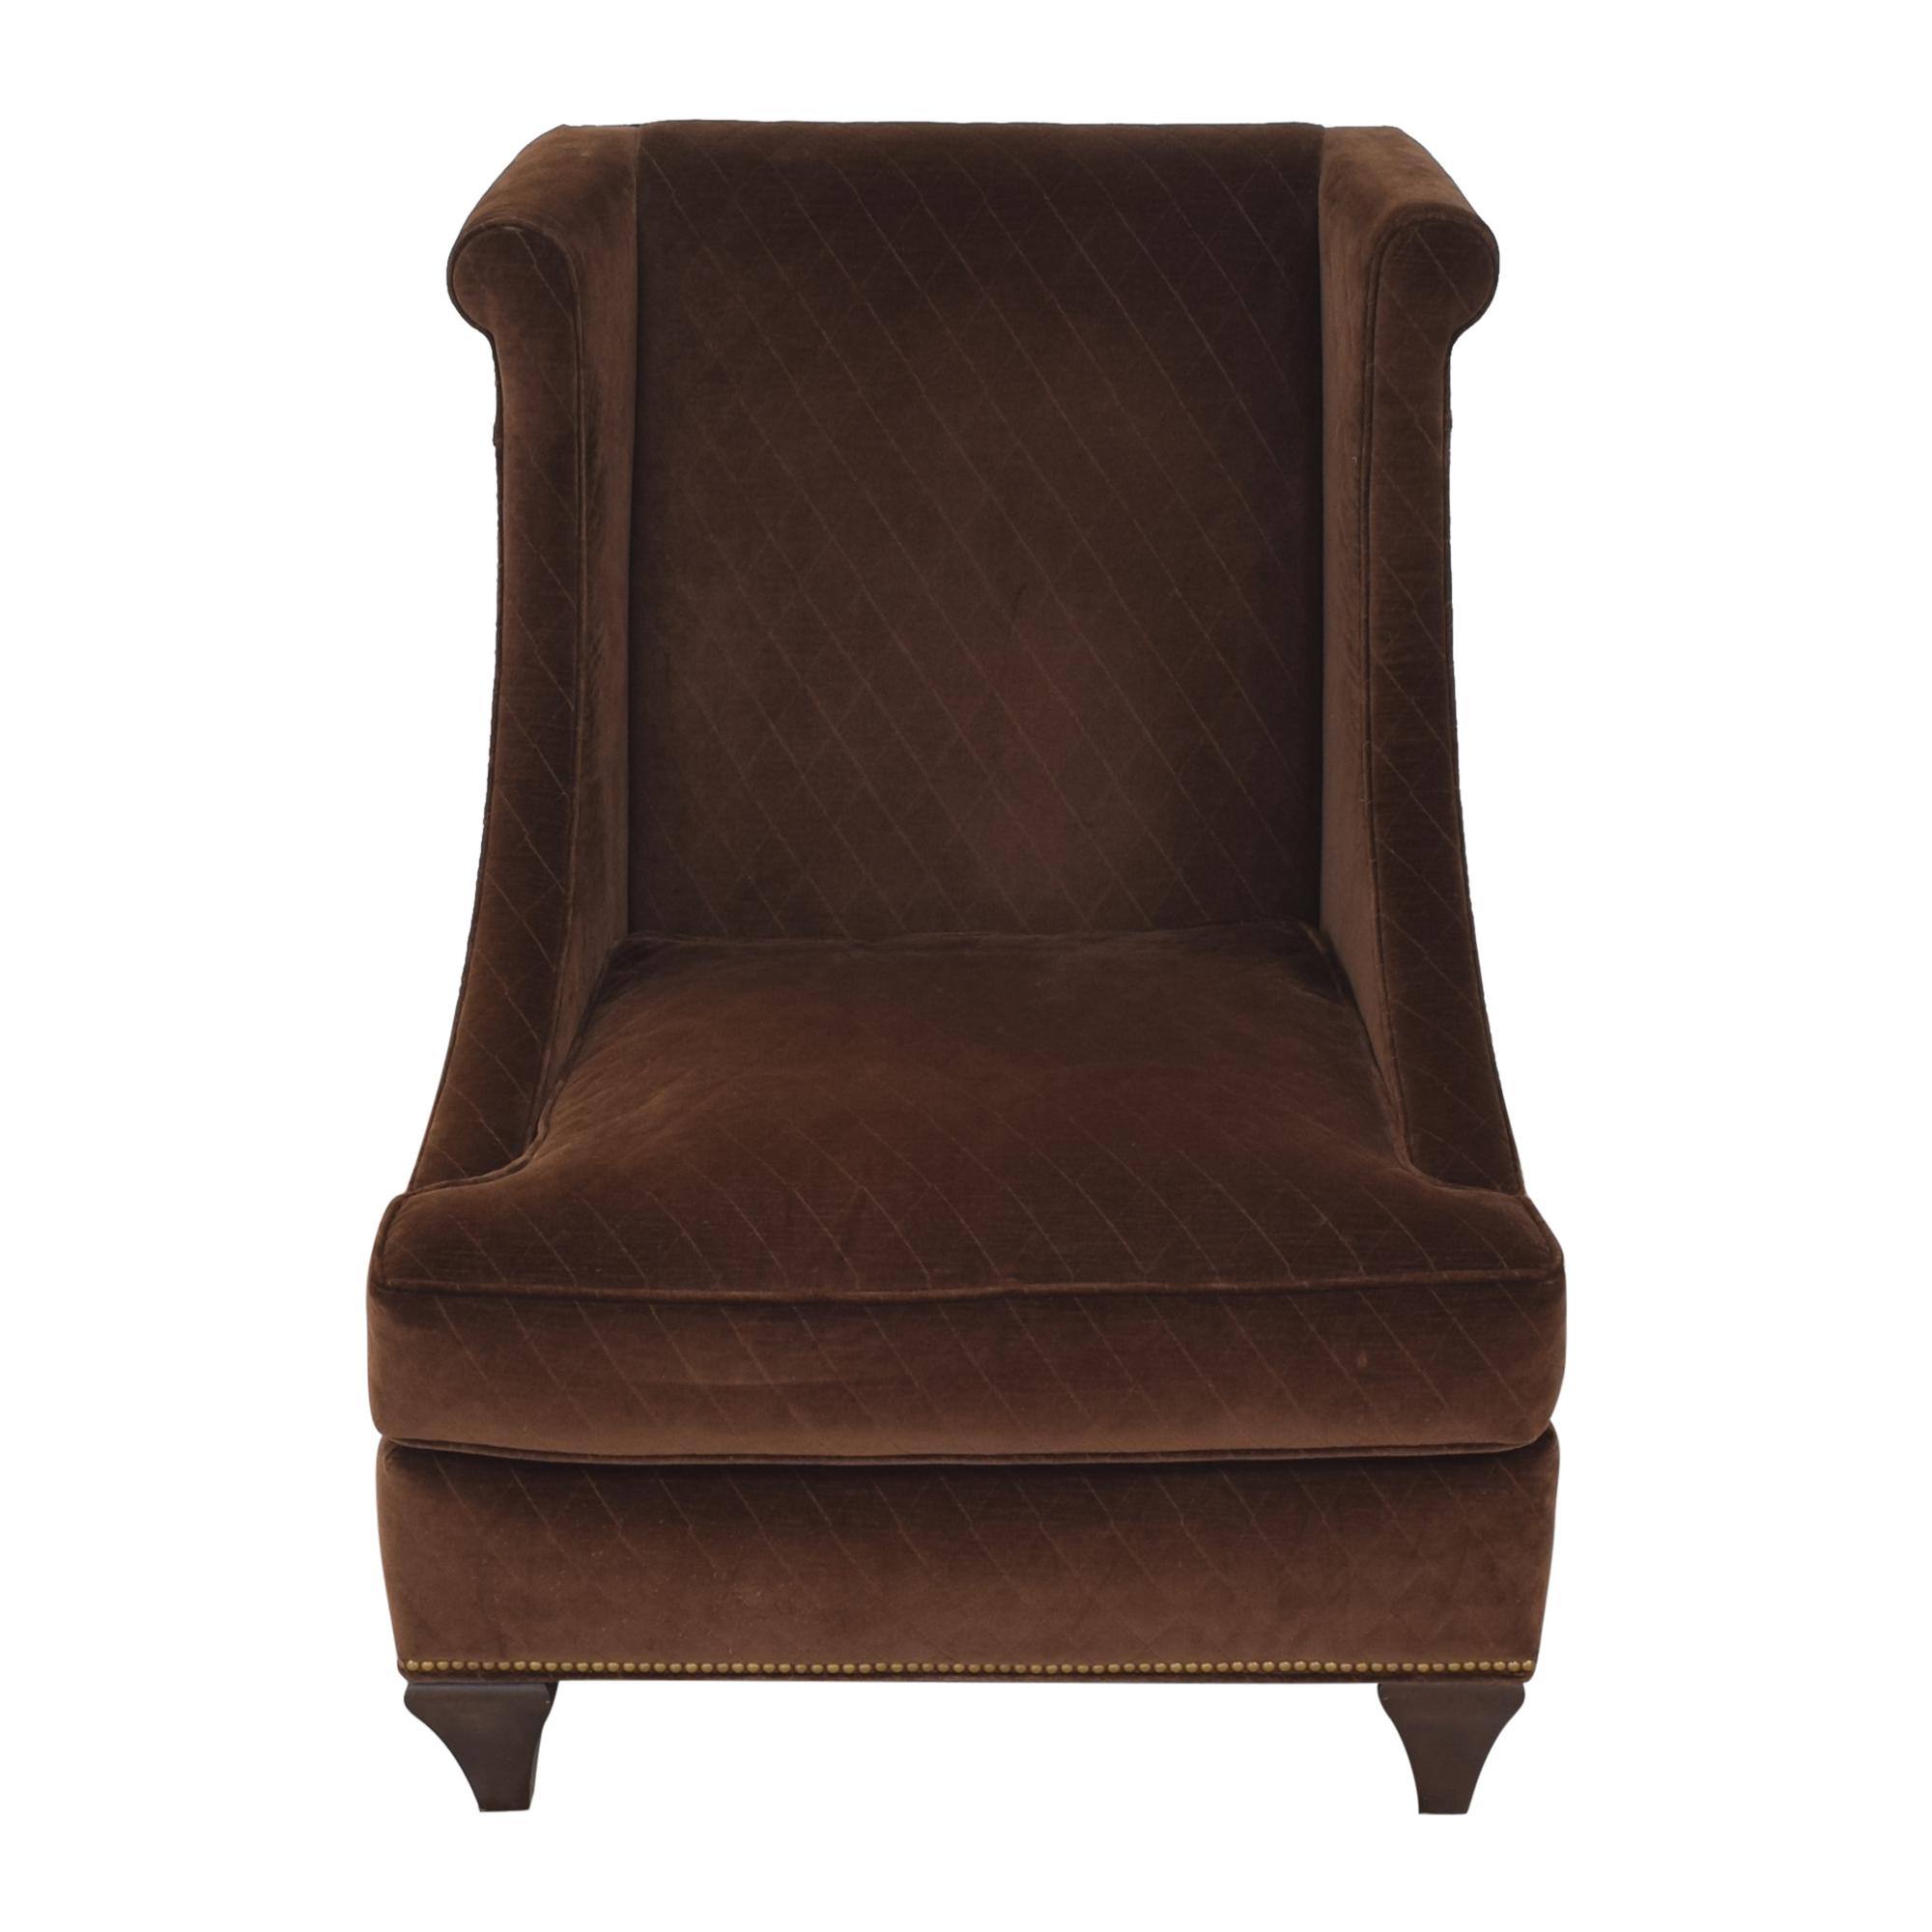 shop Stanford Furniture Stanford Furniture Blane Chair online